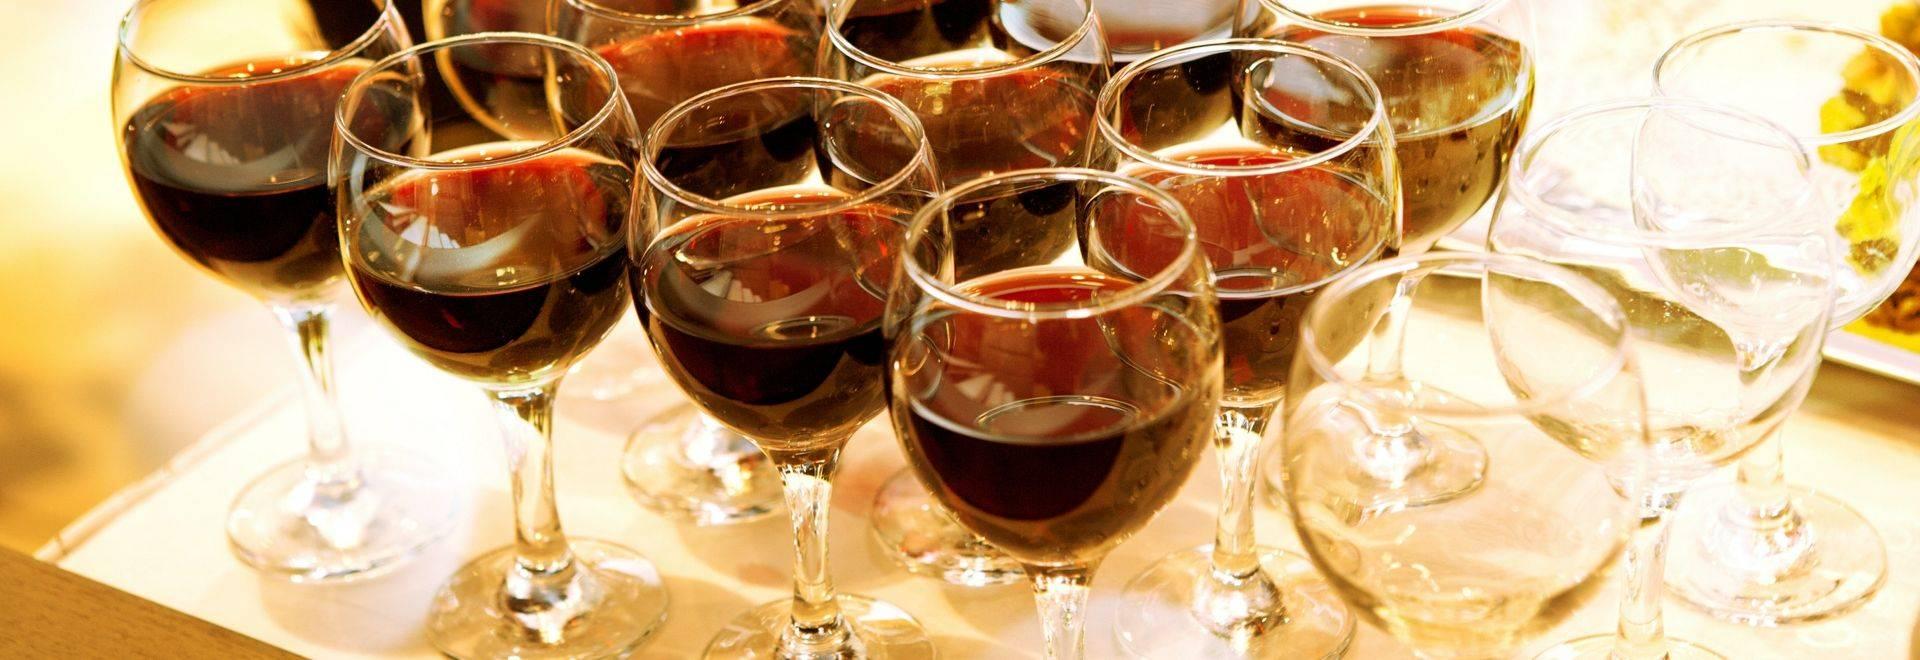 Dreamstime L 32368454 Wine Glasses